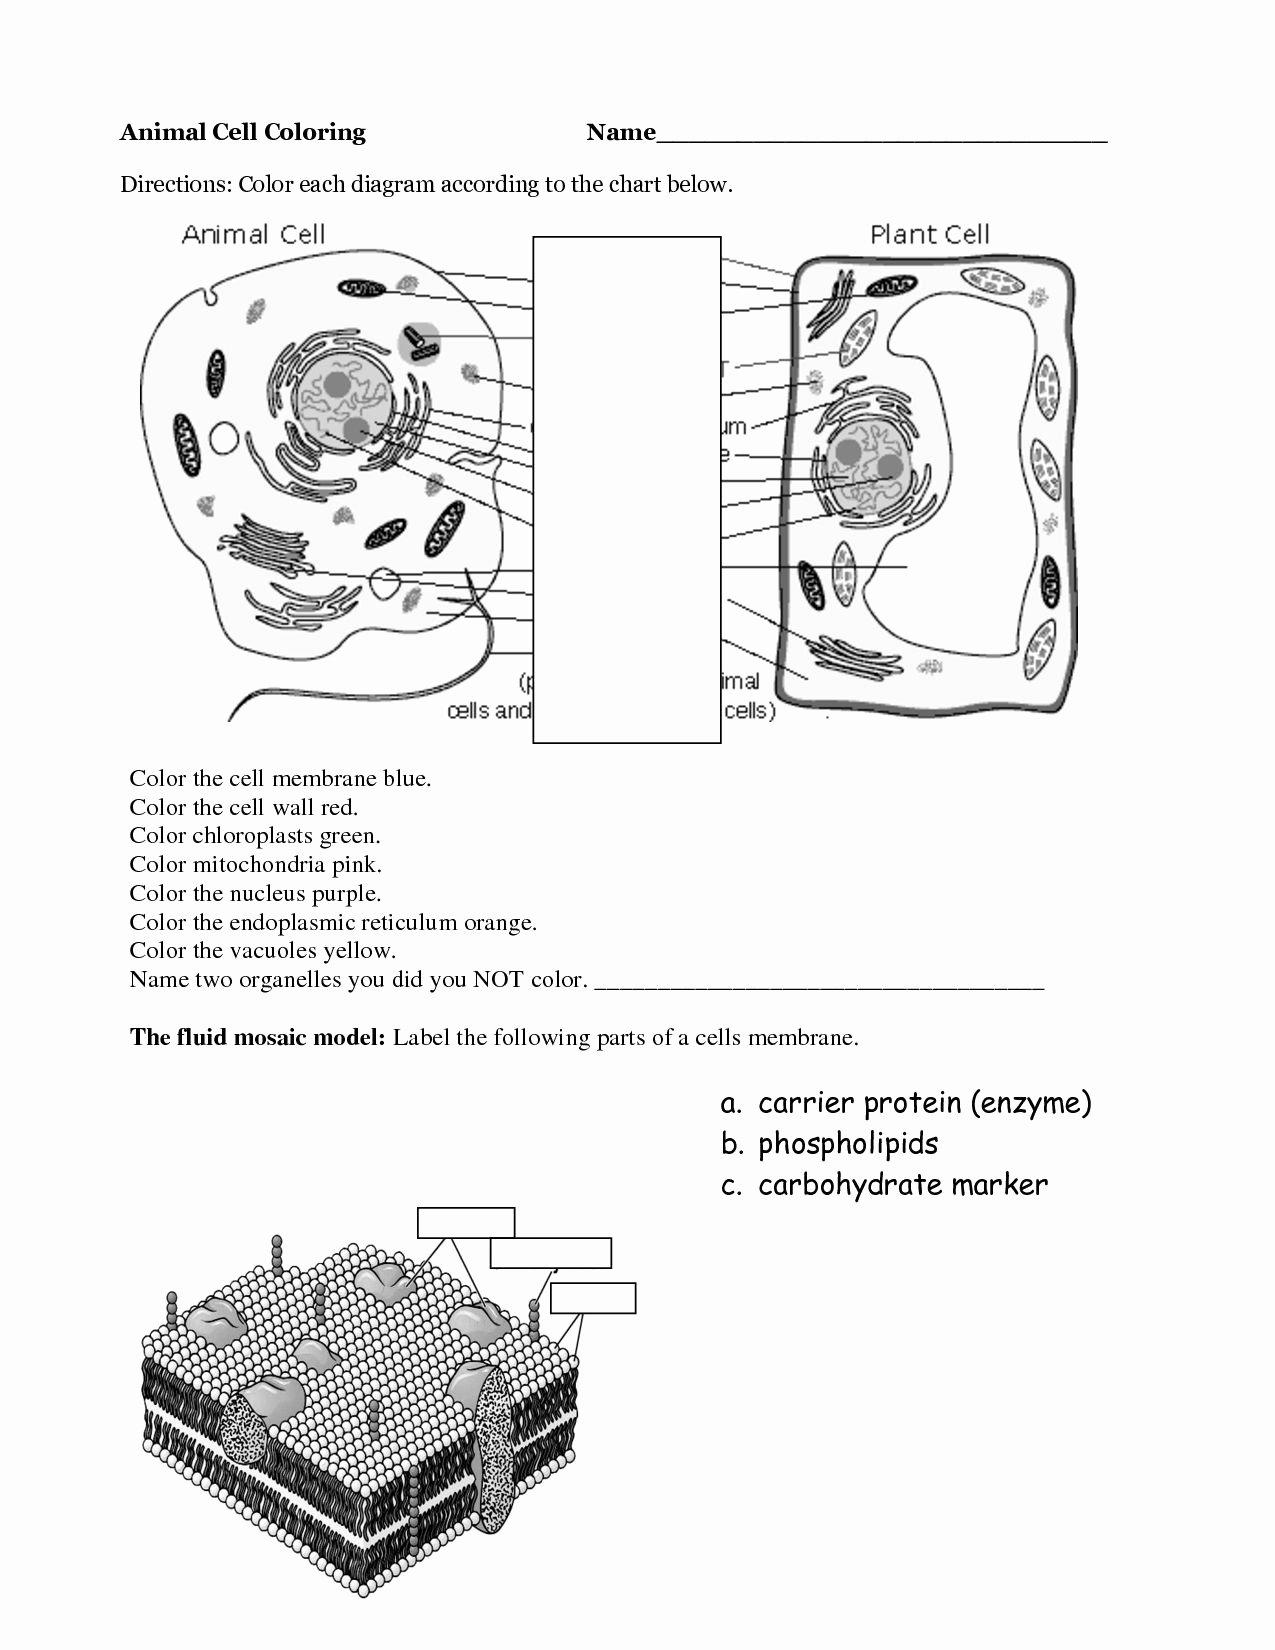 49 Animal Cells Coloring Worksheet